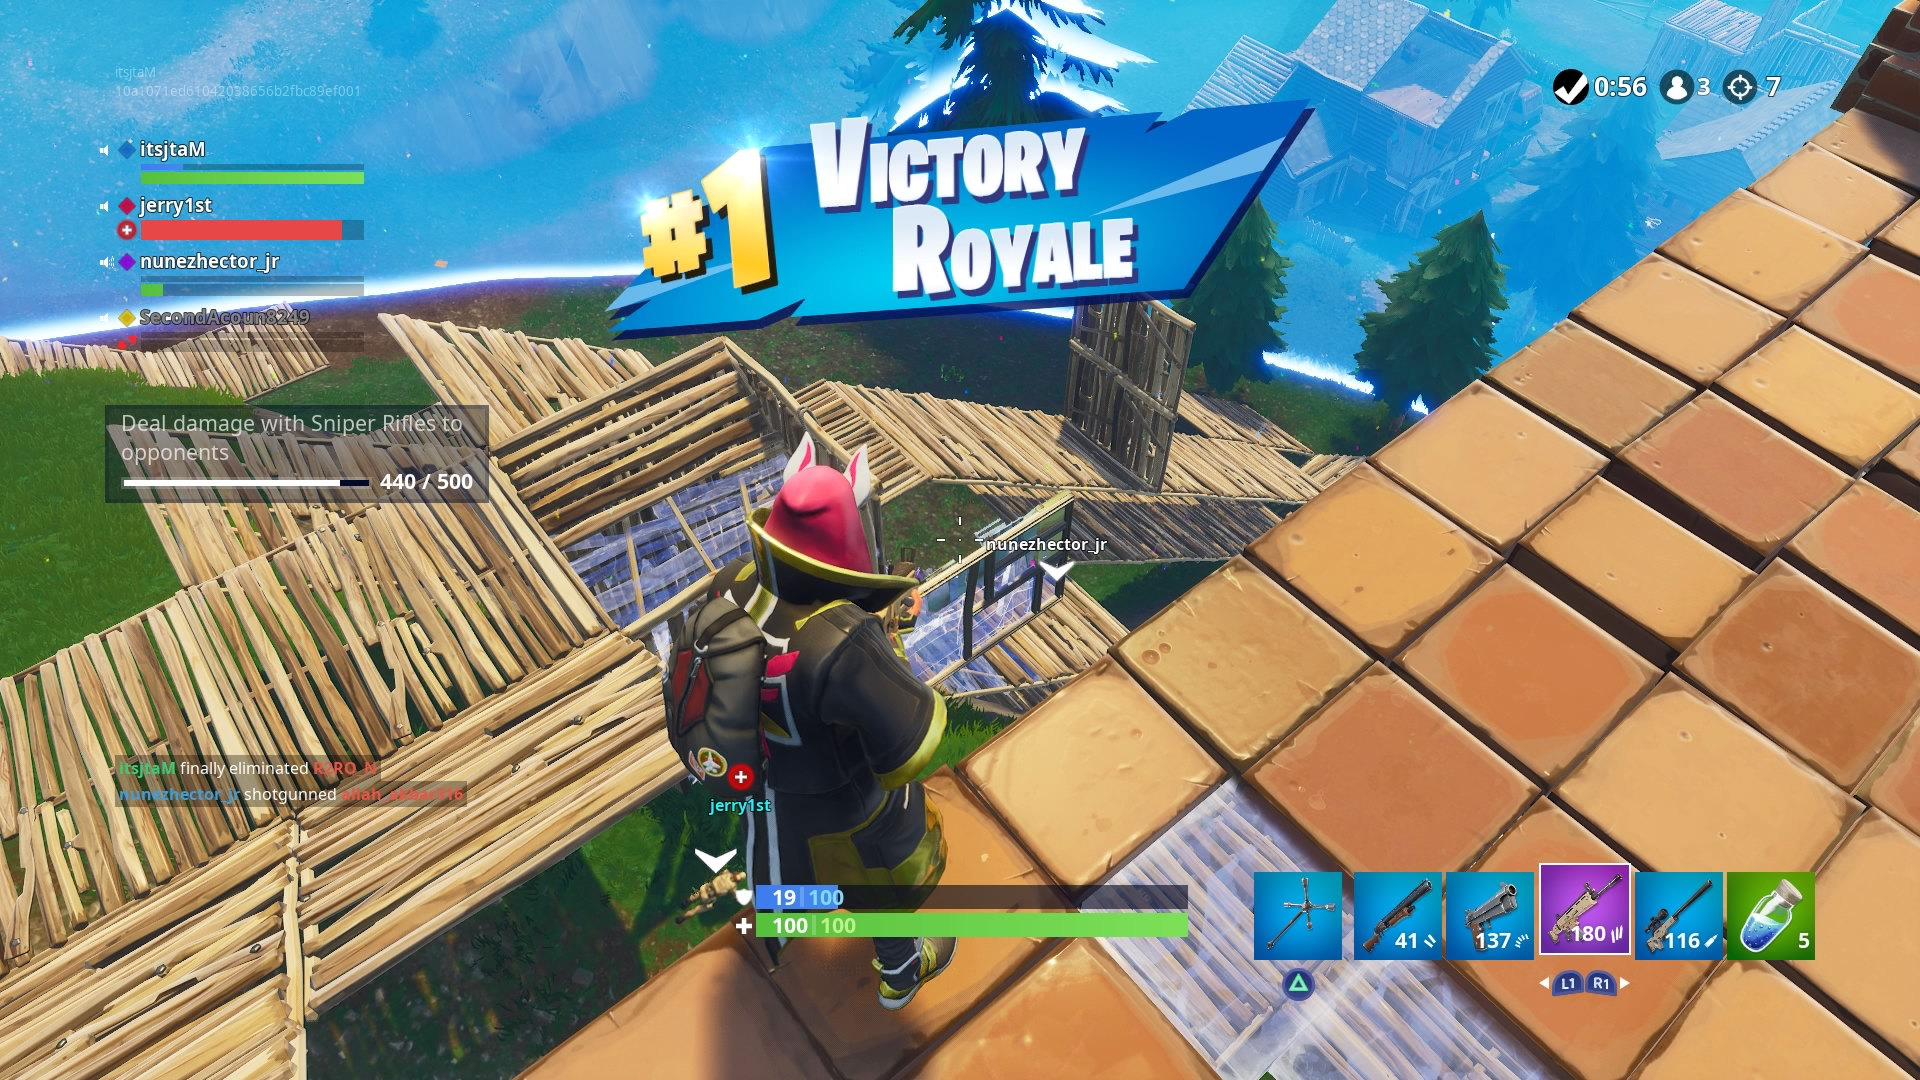 fortnite squad victory wallpaper 64841